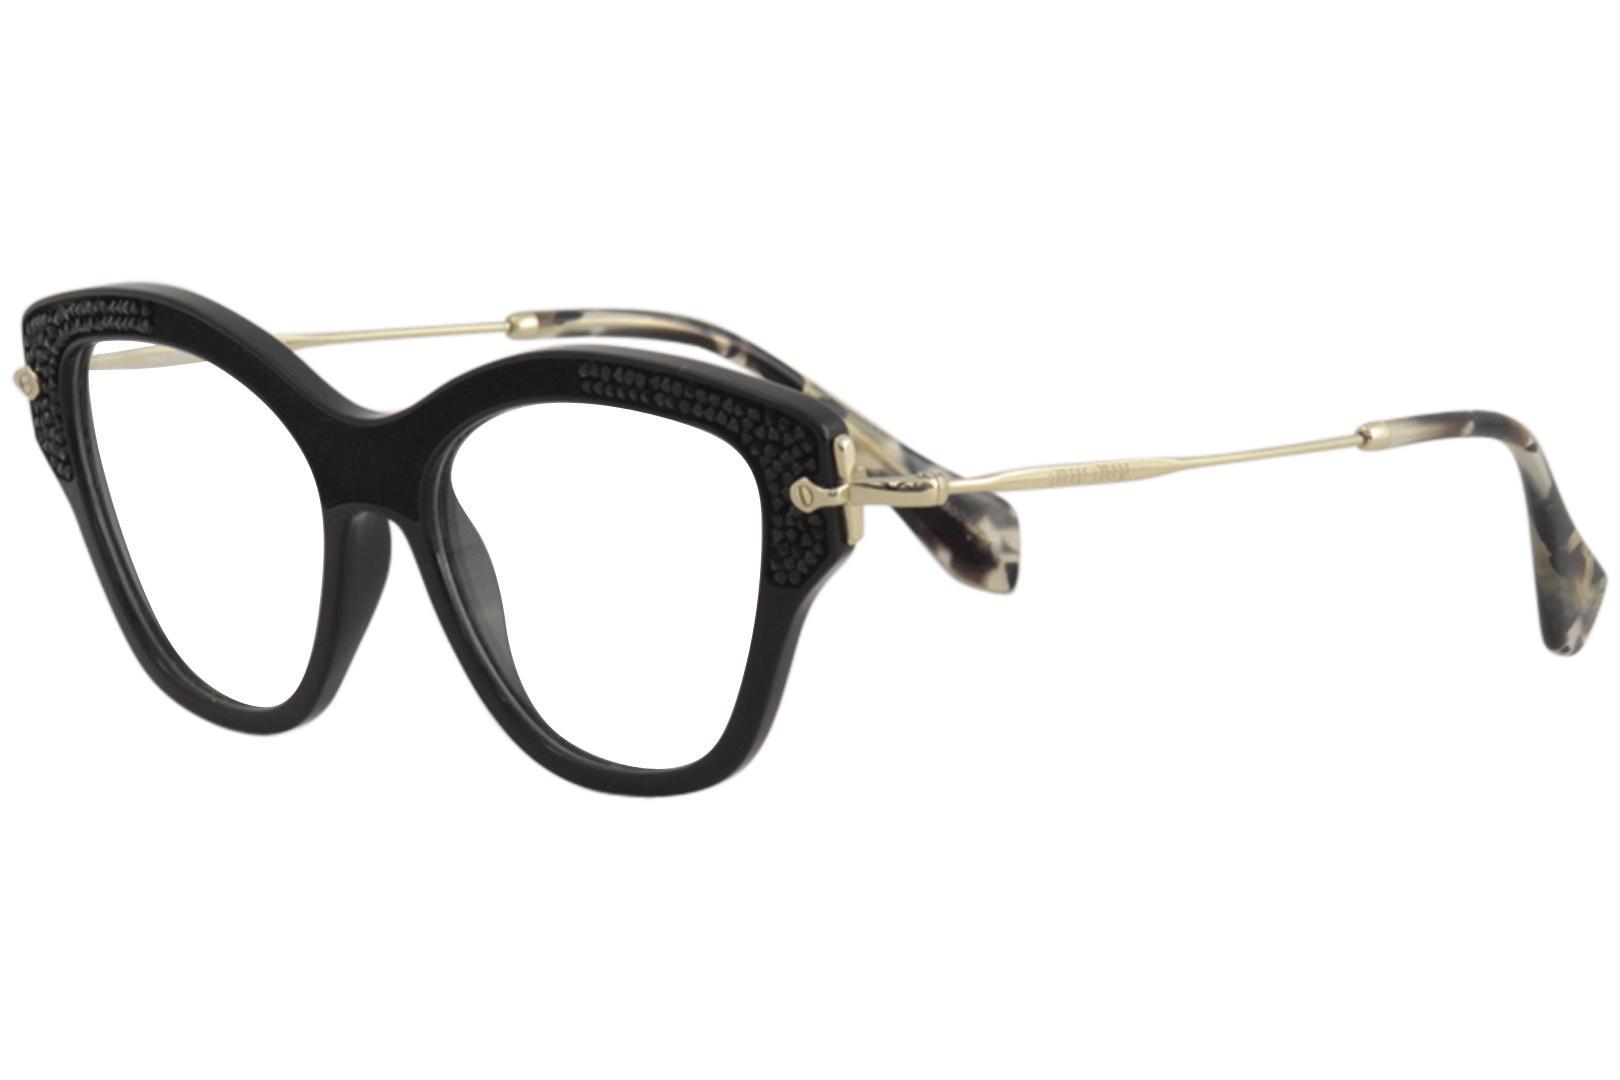 88572d6b37a3 Miu Miu Women s Eyeglasses MU07OV MU 07 OV Optical Frame 52mm